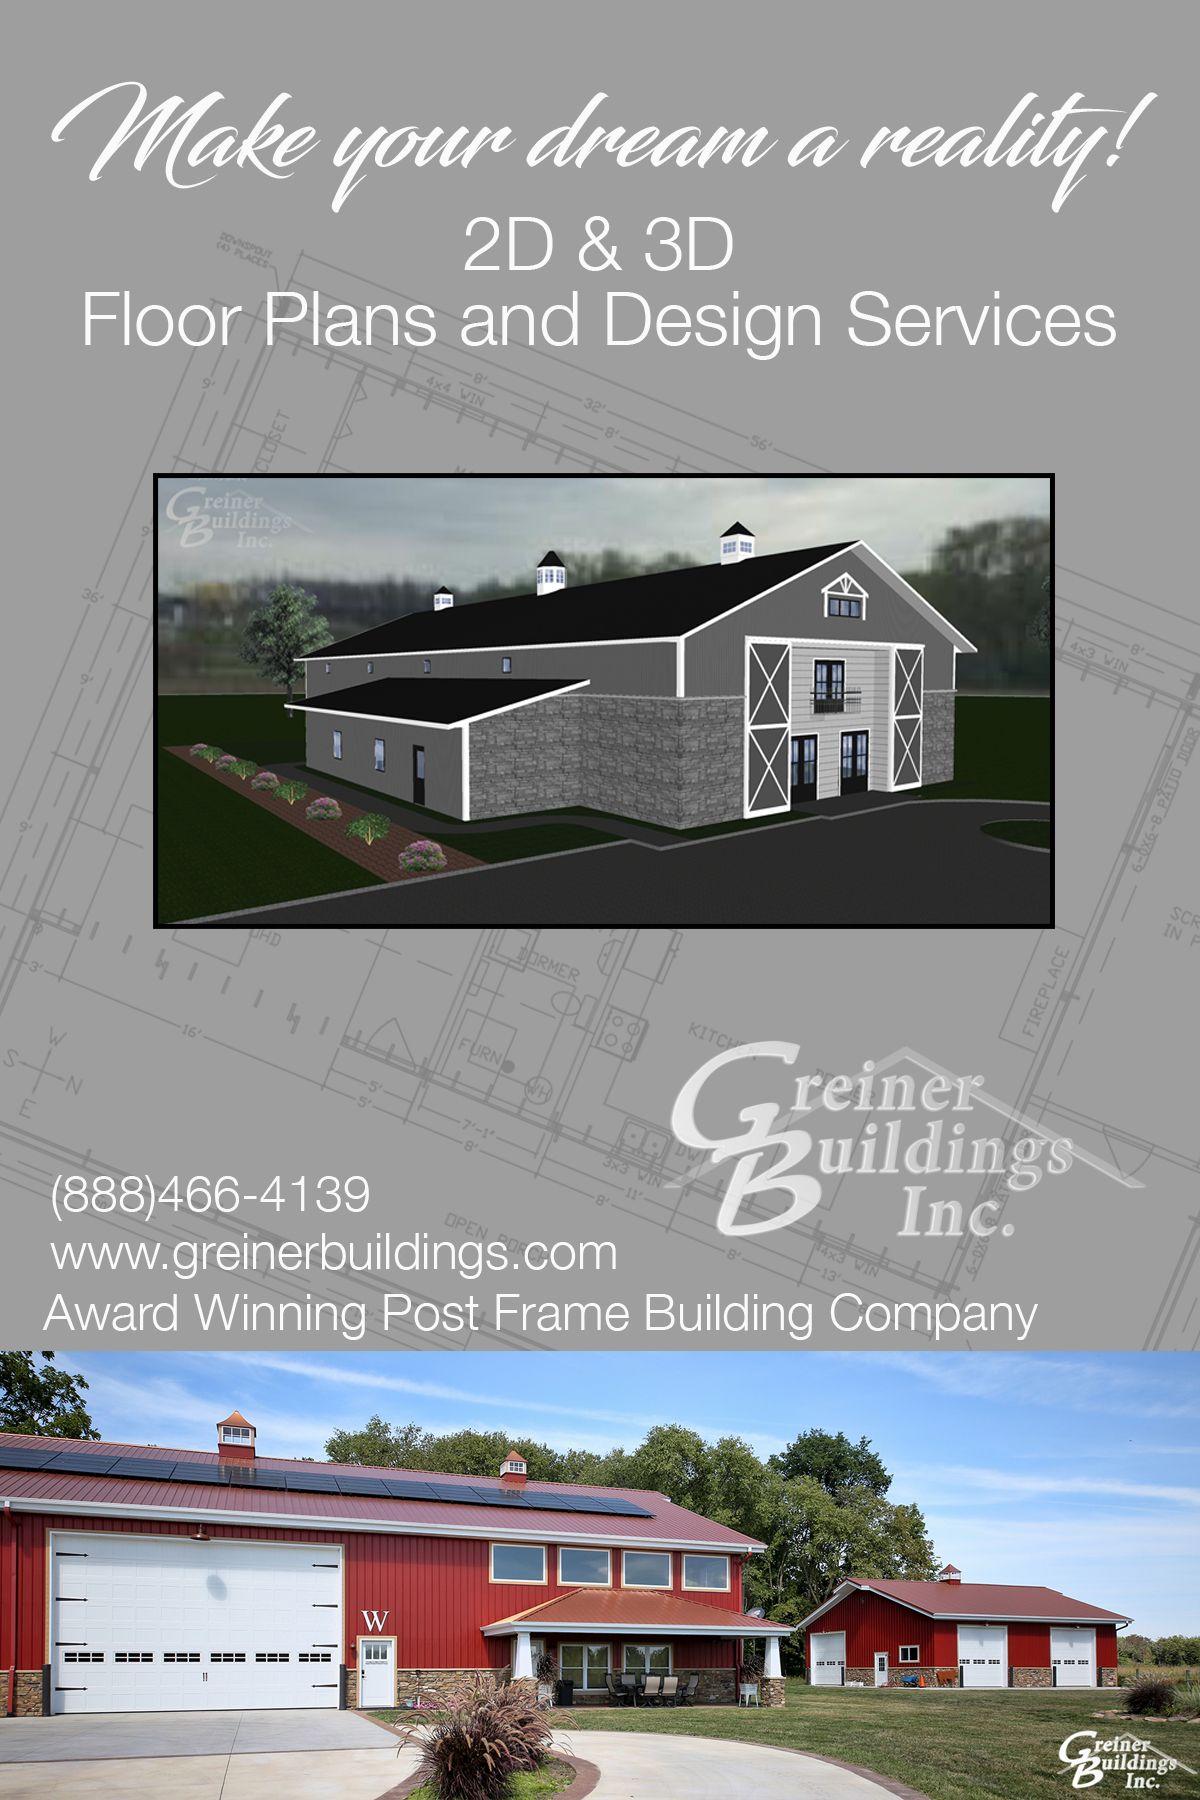 Post Frame Floor Plans by Greiner Buildings Inc Award Winning – Commercial Garage Building Plans